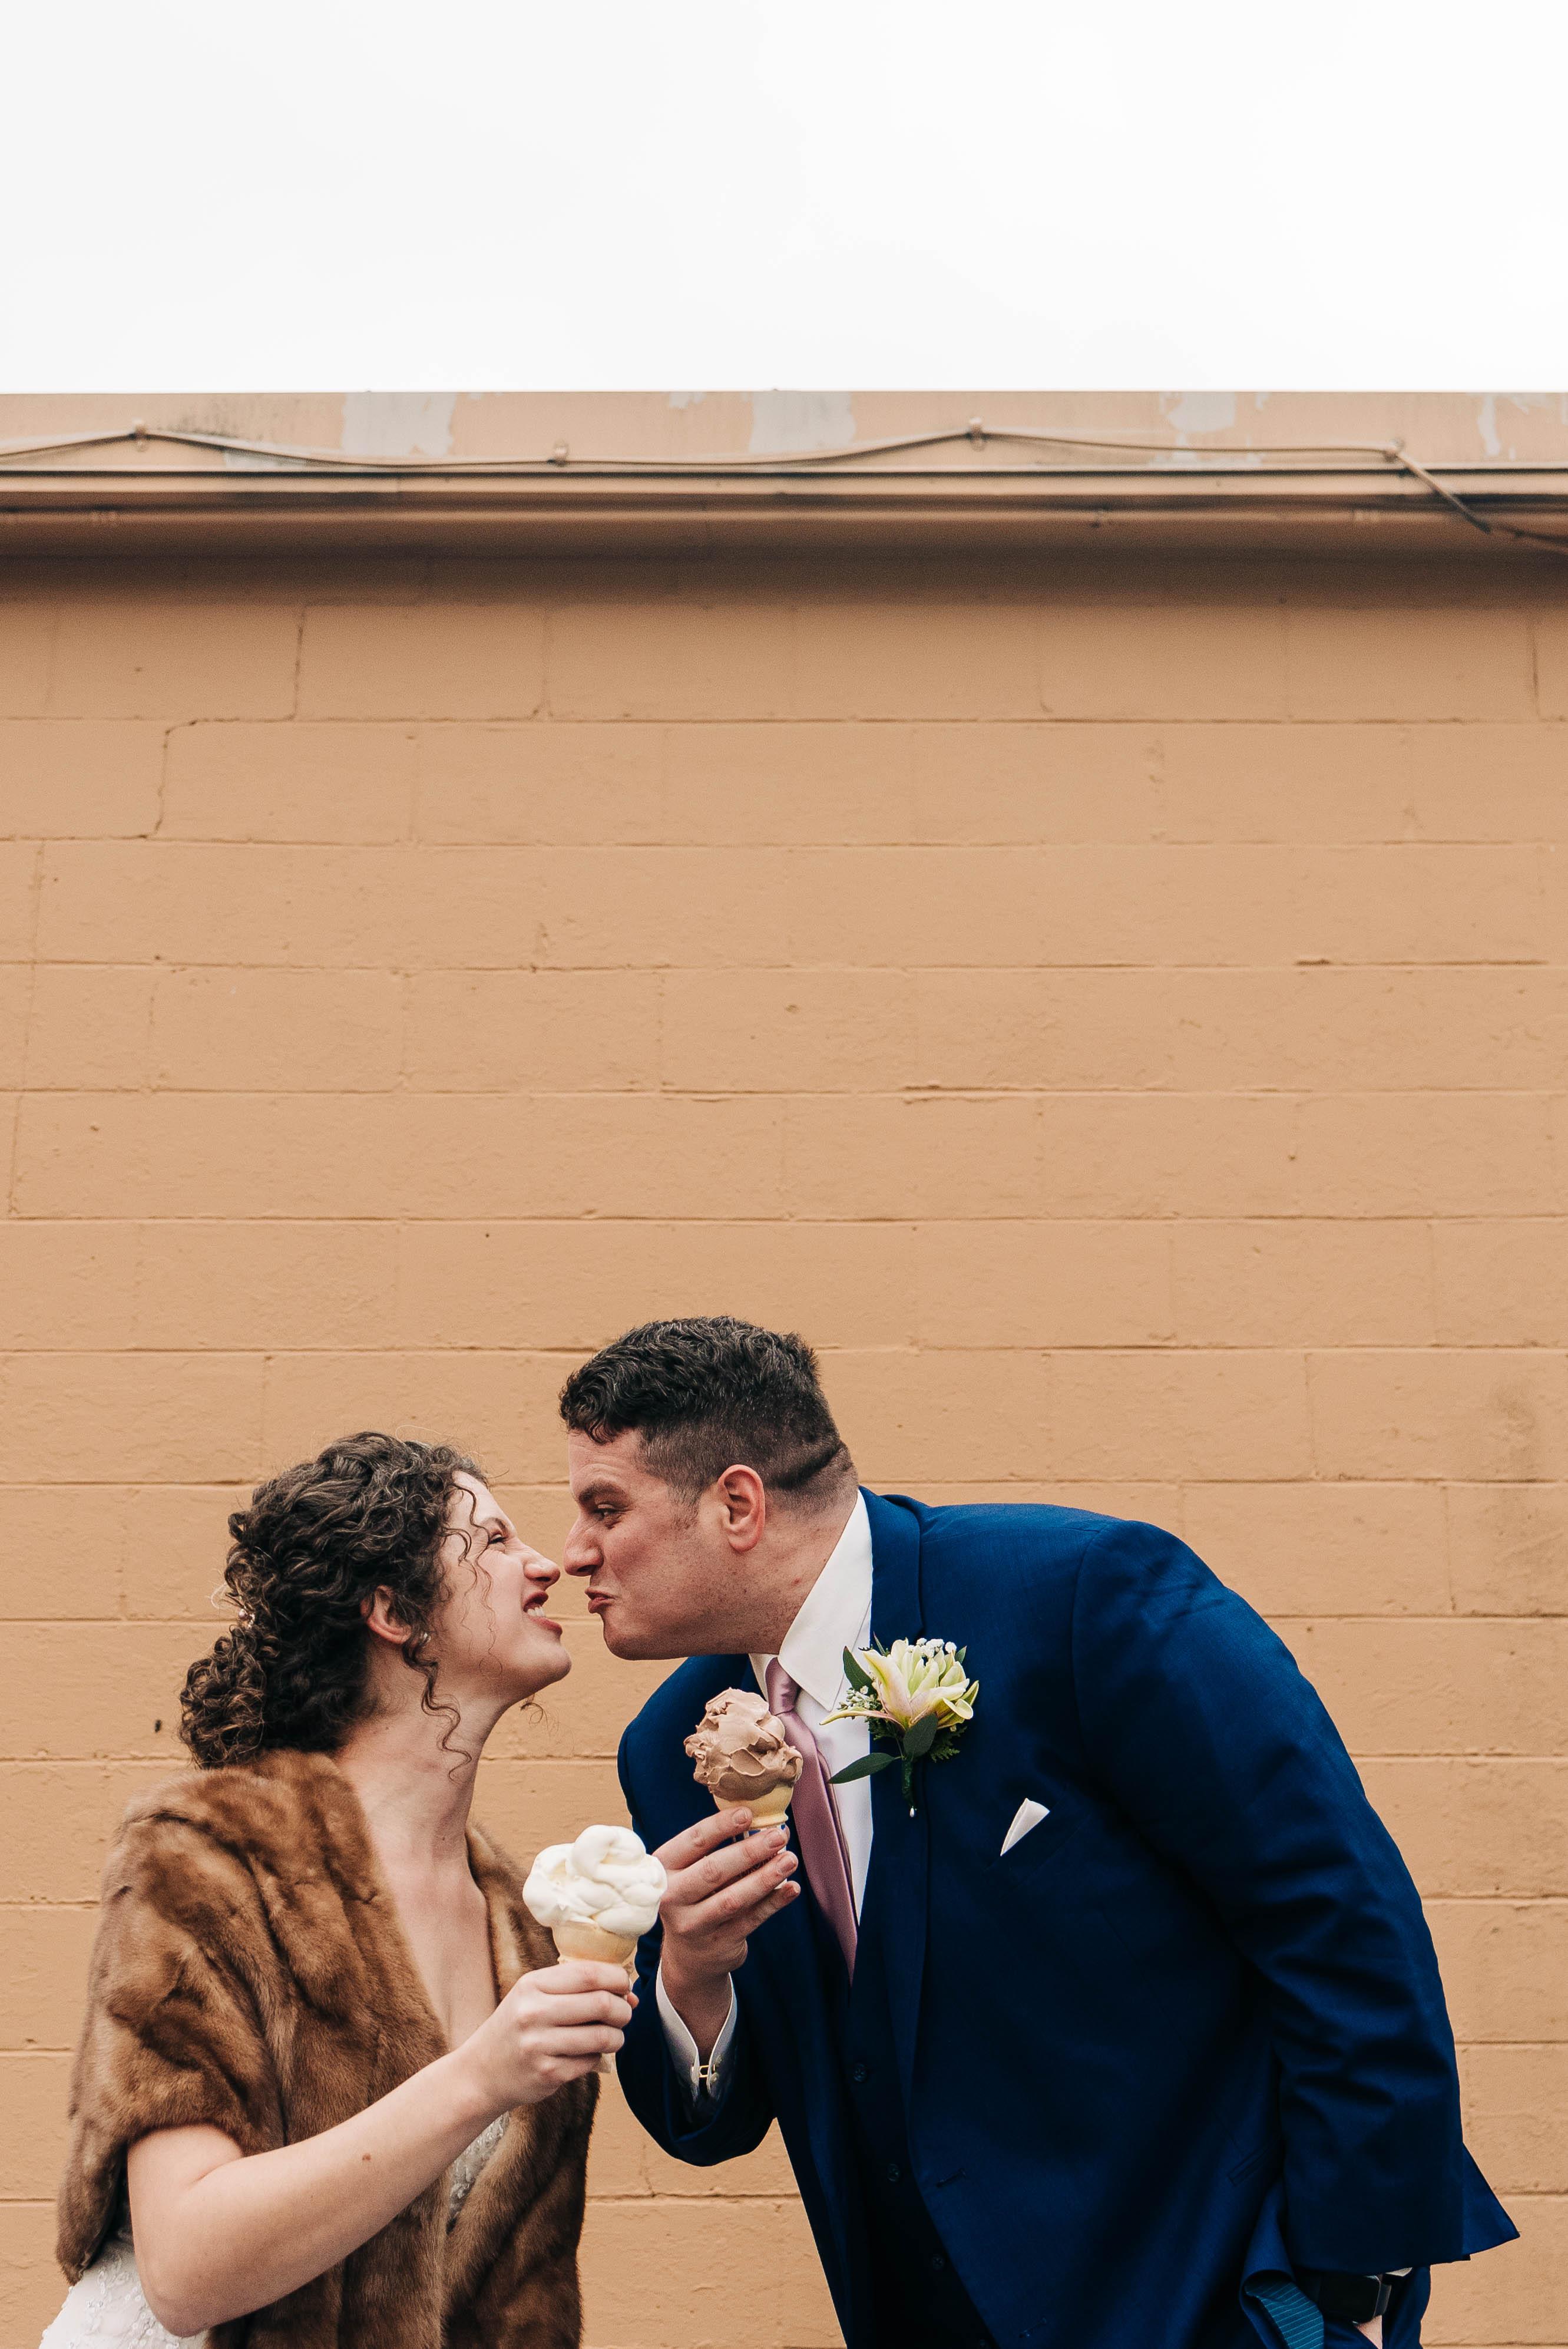 Wedding photo of my wife and I.